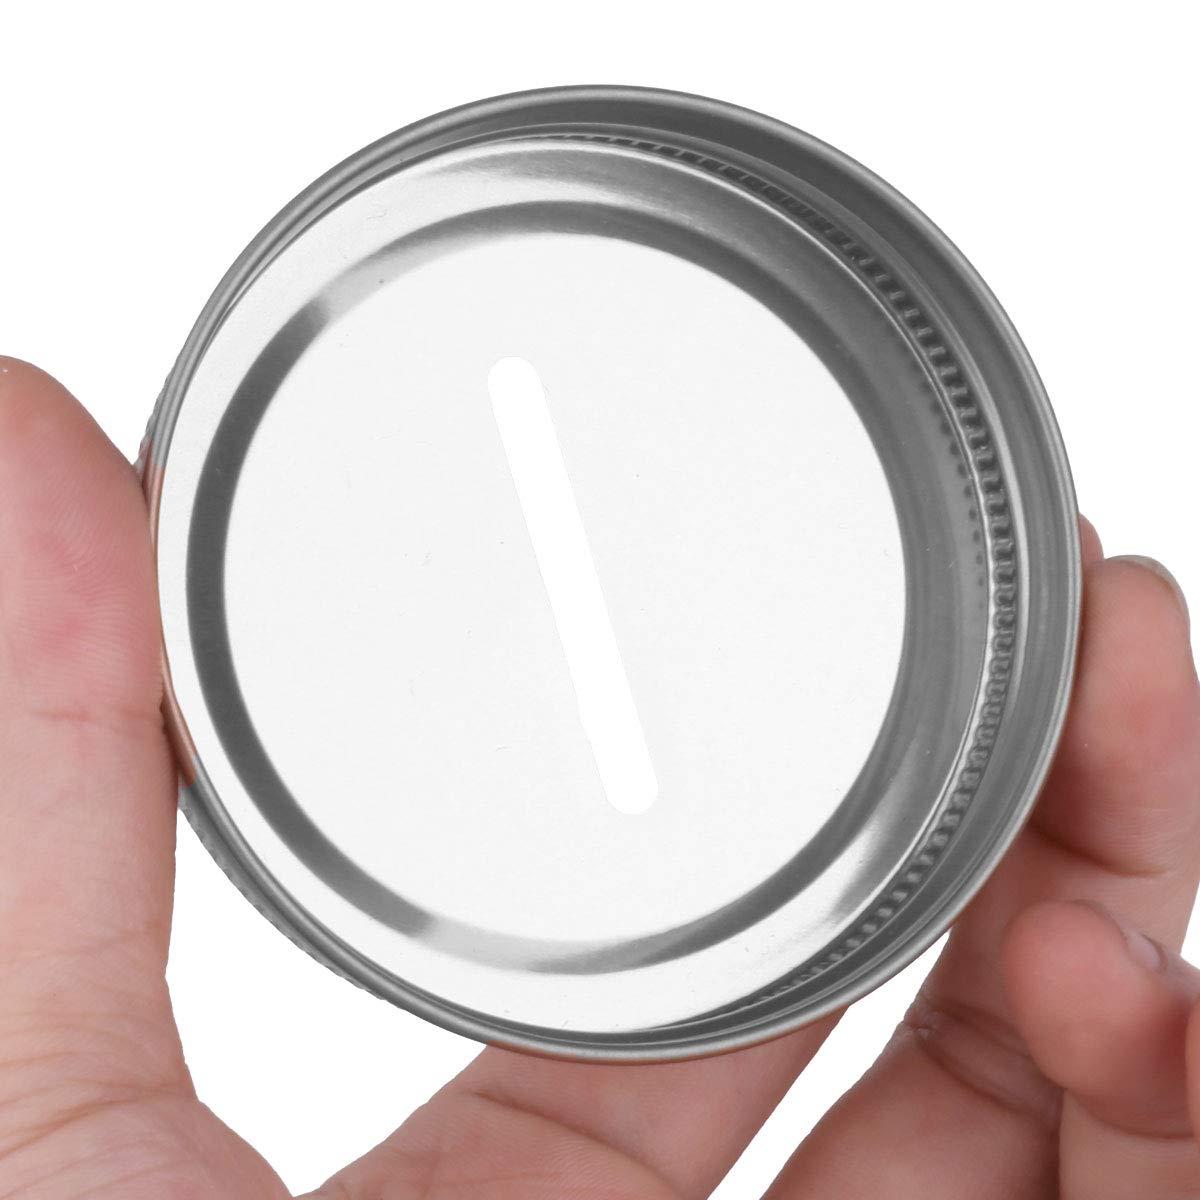 TiaoBug 8 Pieces Metal Coin Slot Bank Lids for Mason Jar Ball Canning Jars Silver One Size by TiaoBug (Image #5)